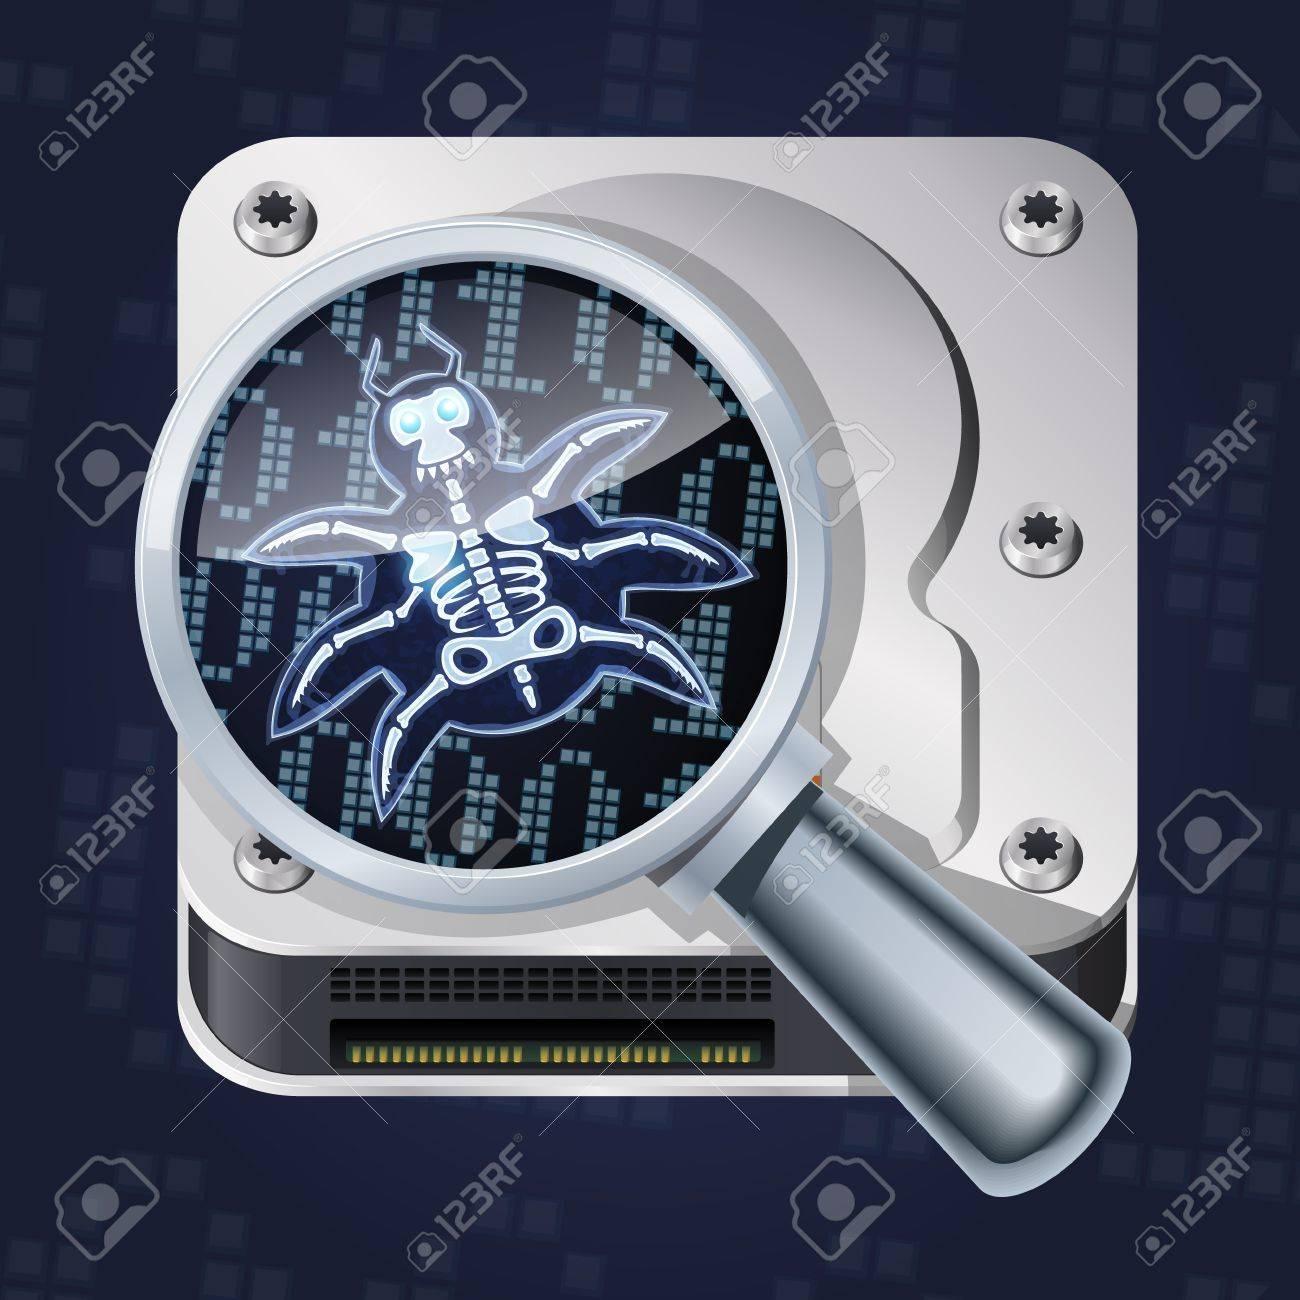 Bug search. Cartoon computer bug or virus under magnifier. Stock Vector - 20654617